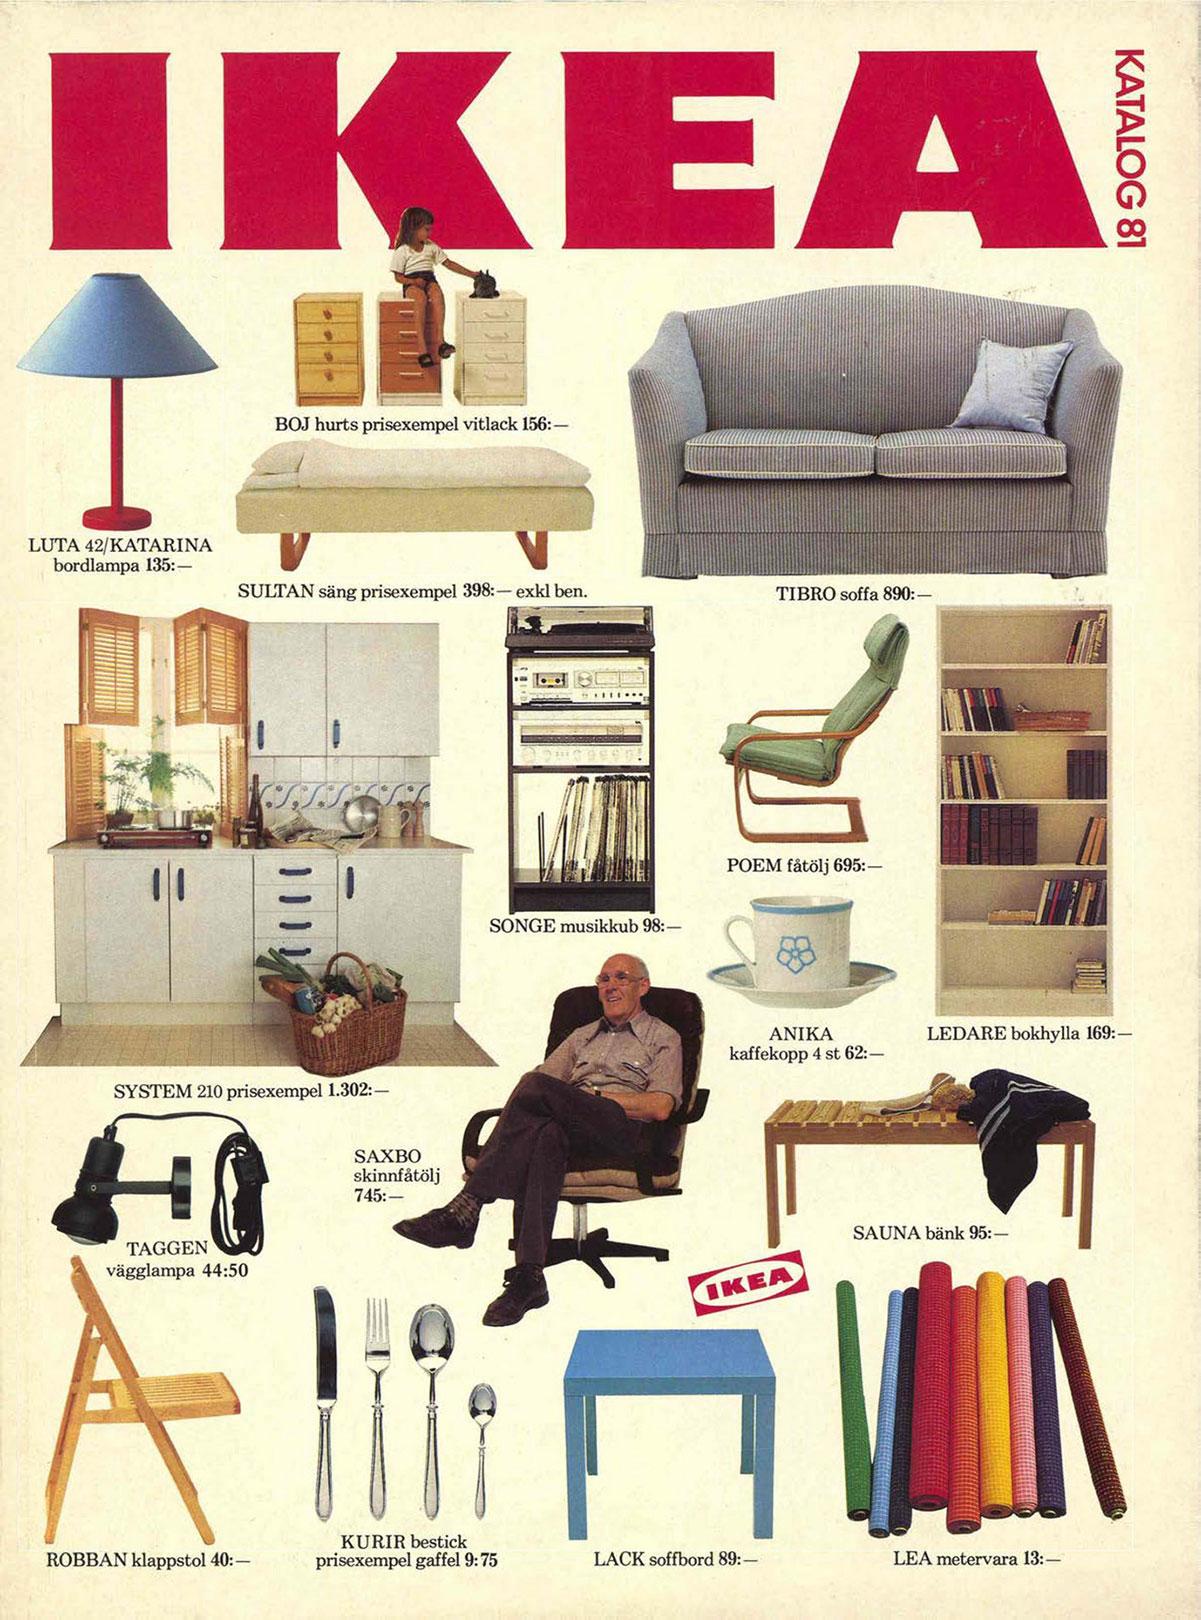 Copertina del catalogo Ikea 1981